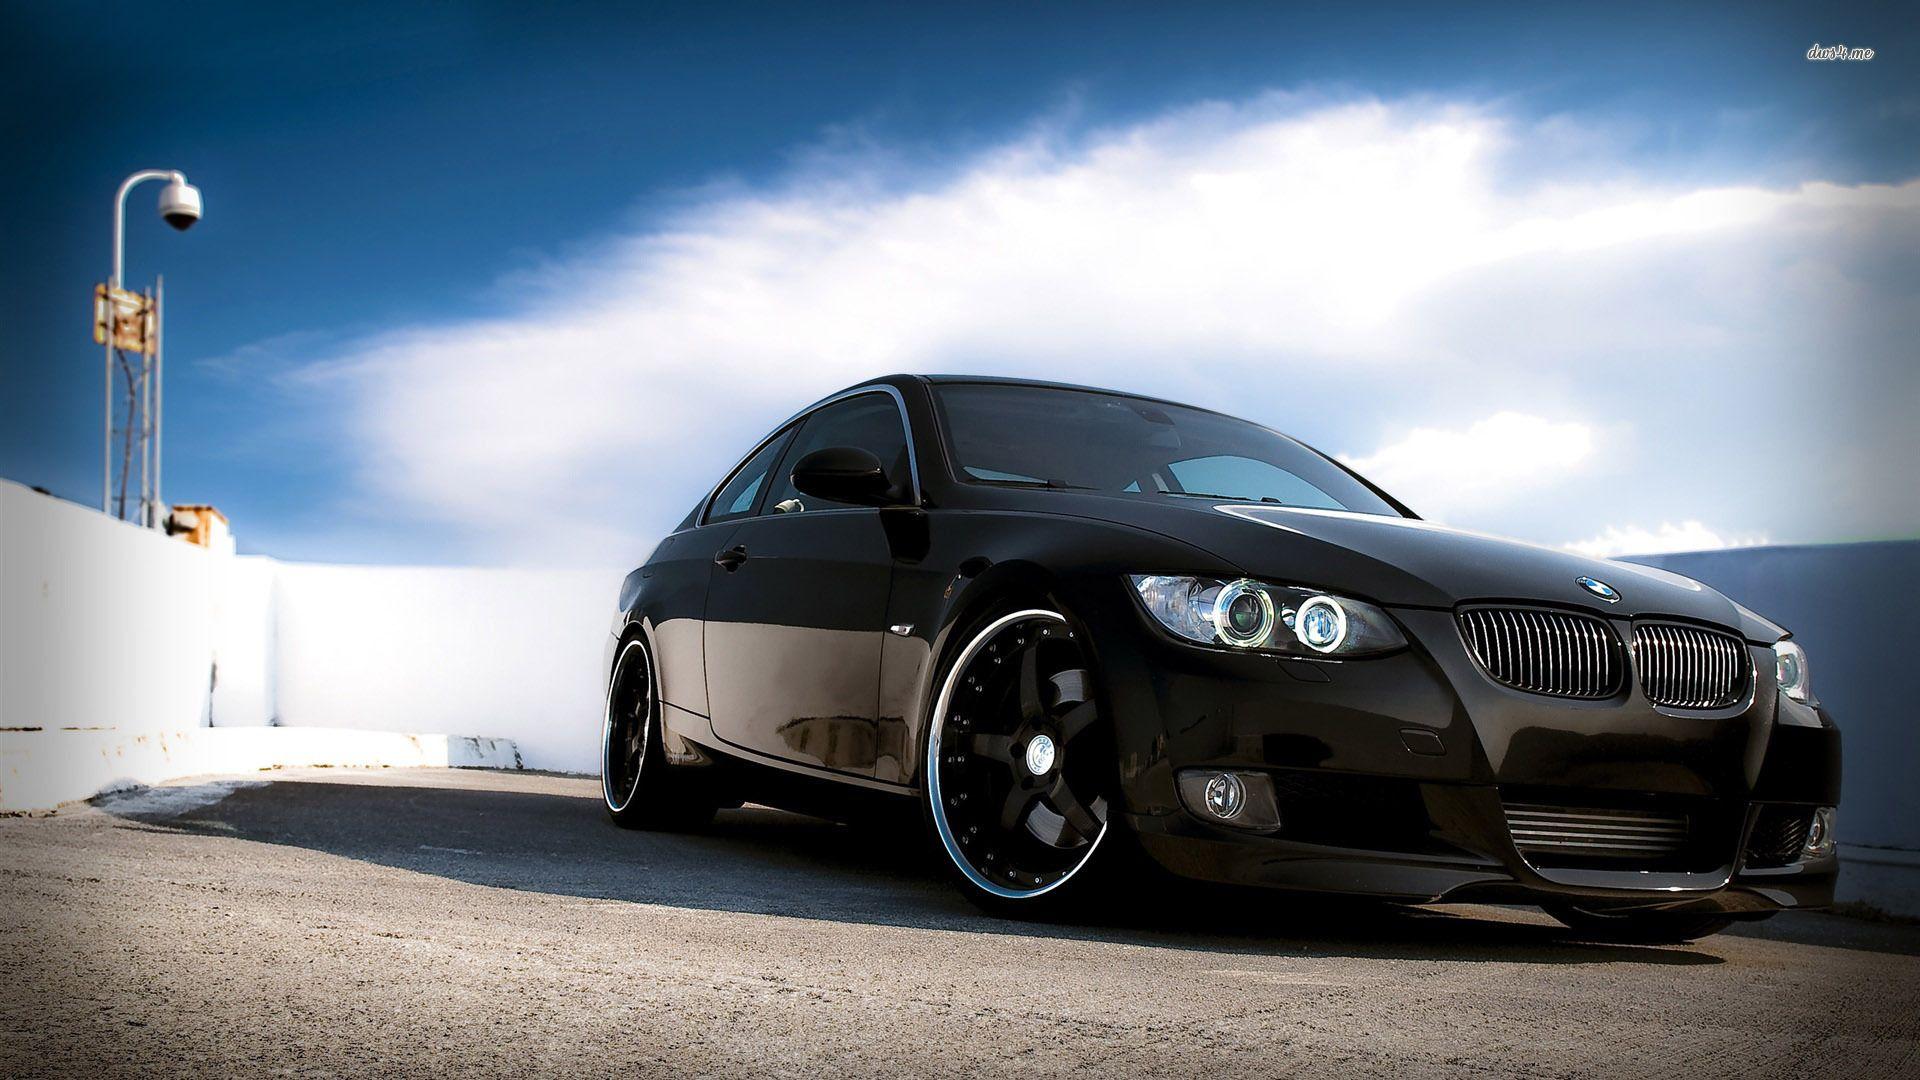 360 Forged Bmw 335i Coupe Hd Wallpaper Bmw Bmw 335i Coupe Bmw Alpina